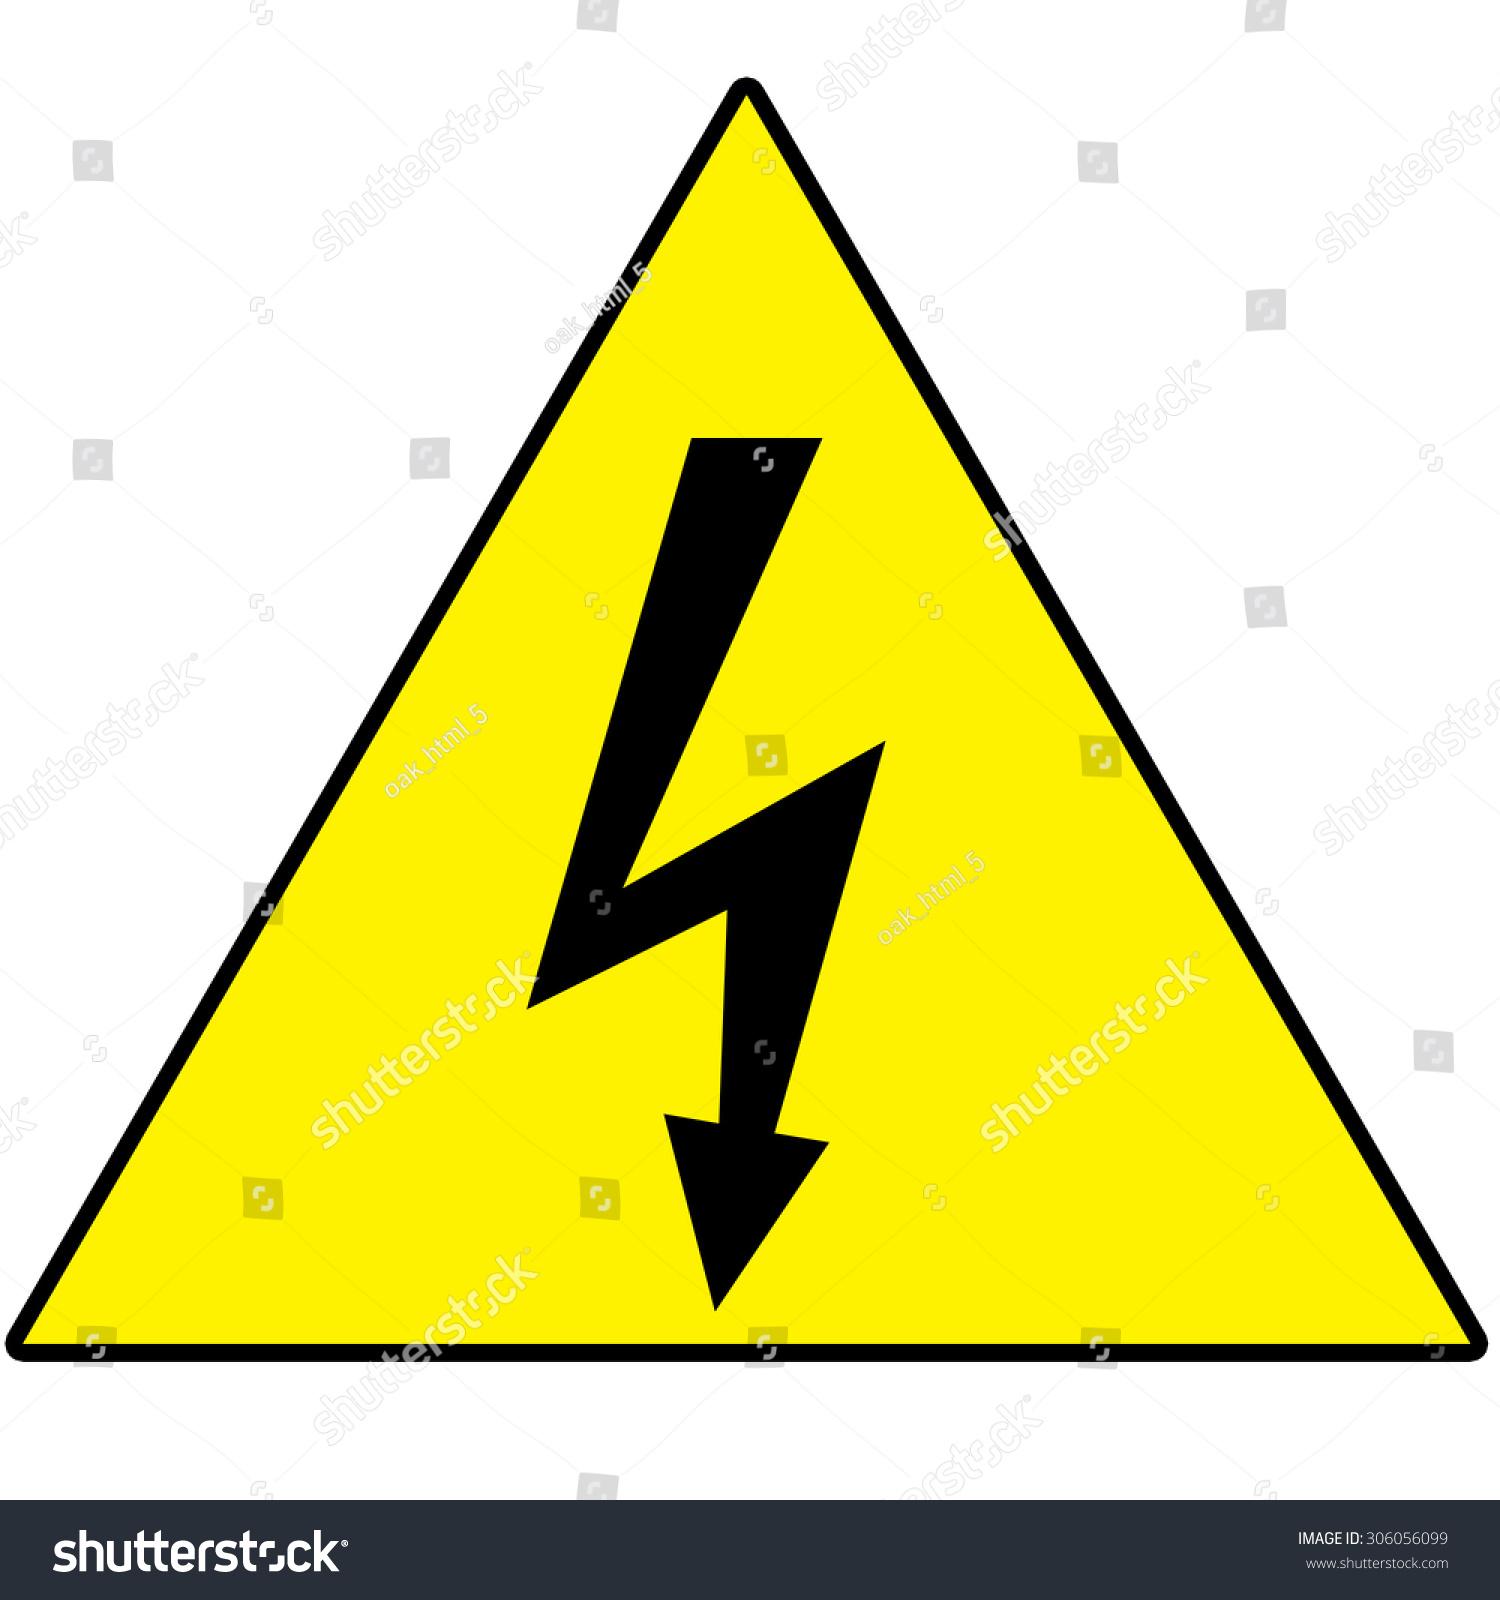 High voltage symbol stock illustration 306056099 shutterstock high voltage symbol buycottarizona